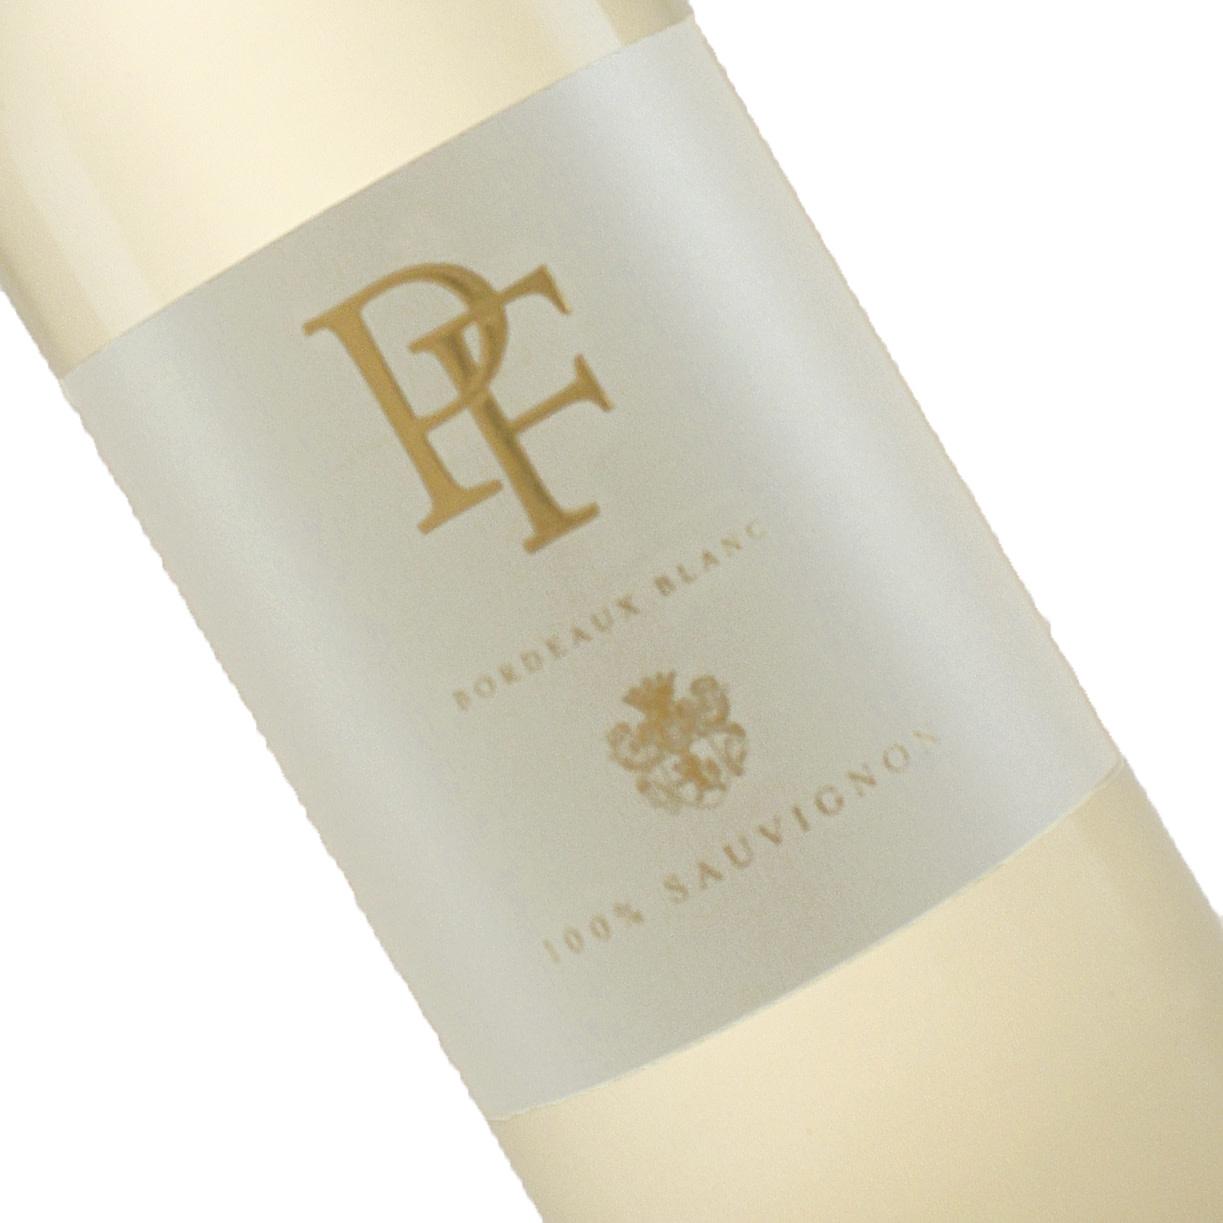 Chateau Petit Freylon 2019 Sauvignon Blanc Bordeaux Blanc